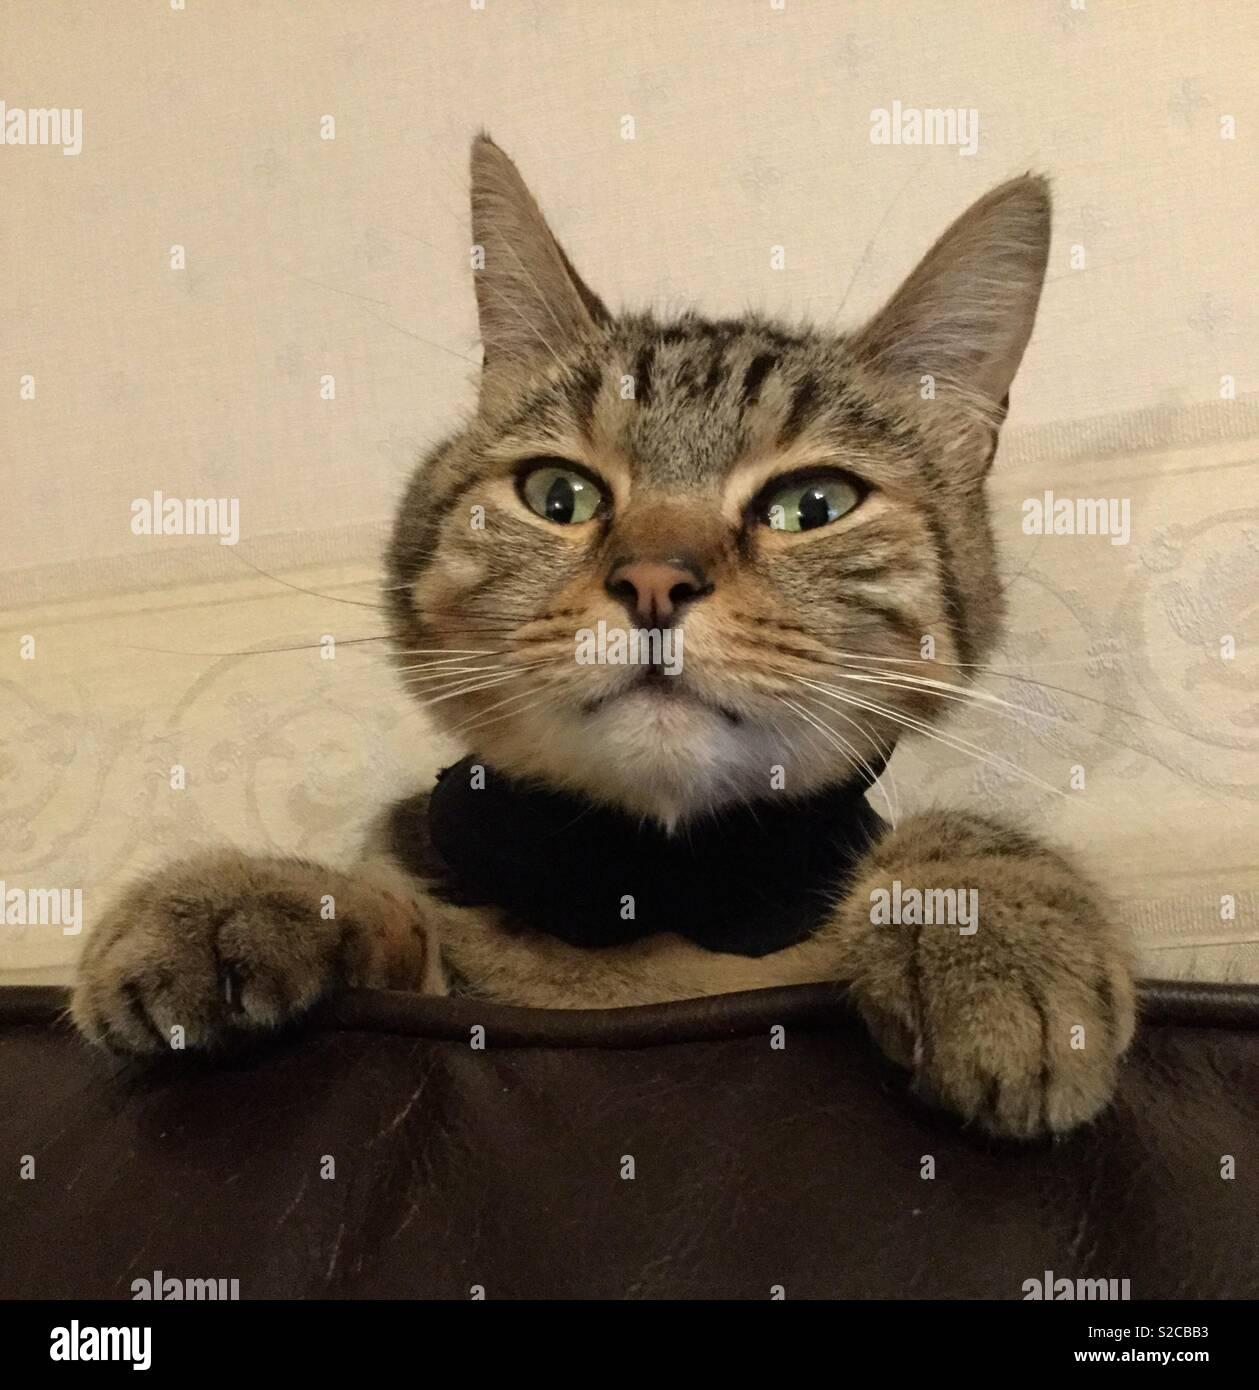 Disgruntled cat - Stock Image